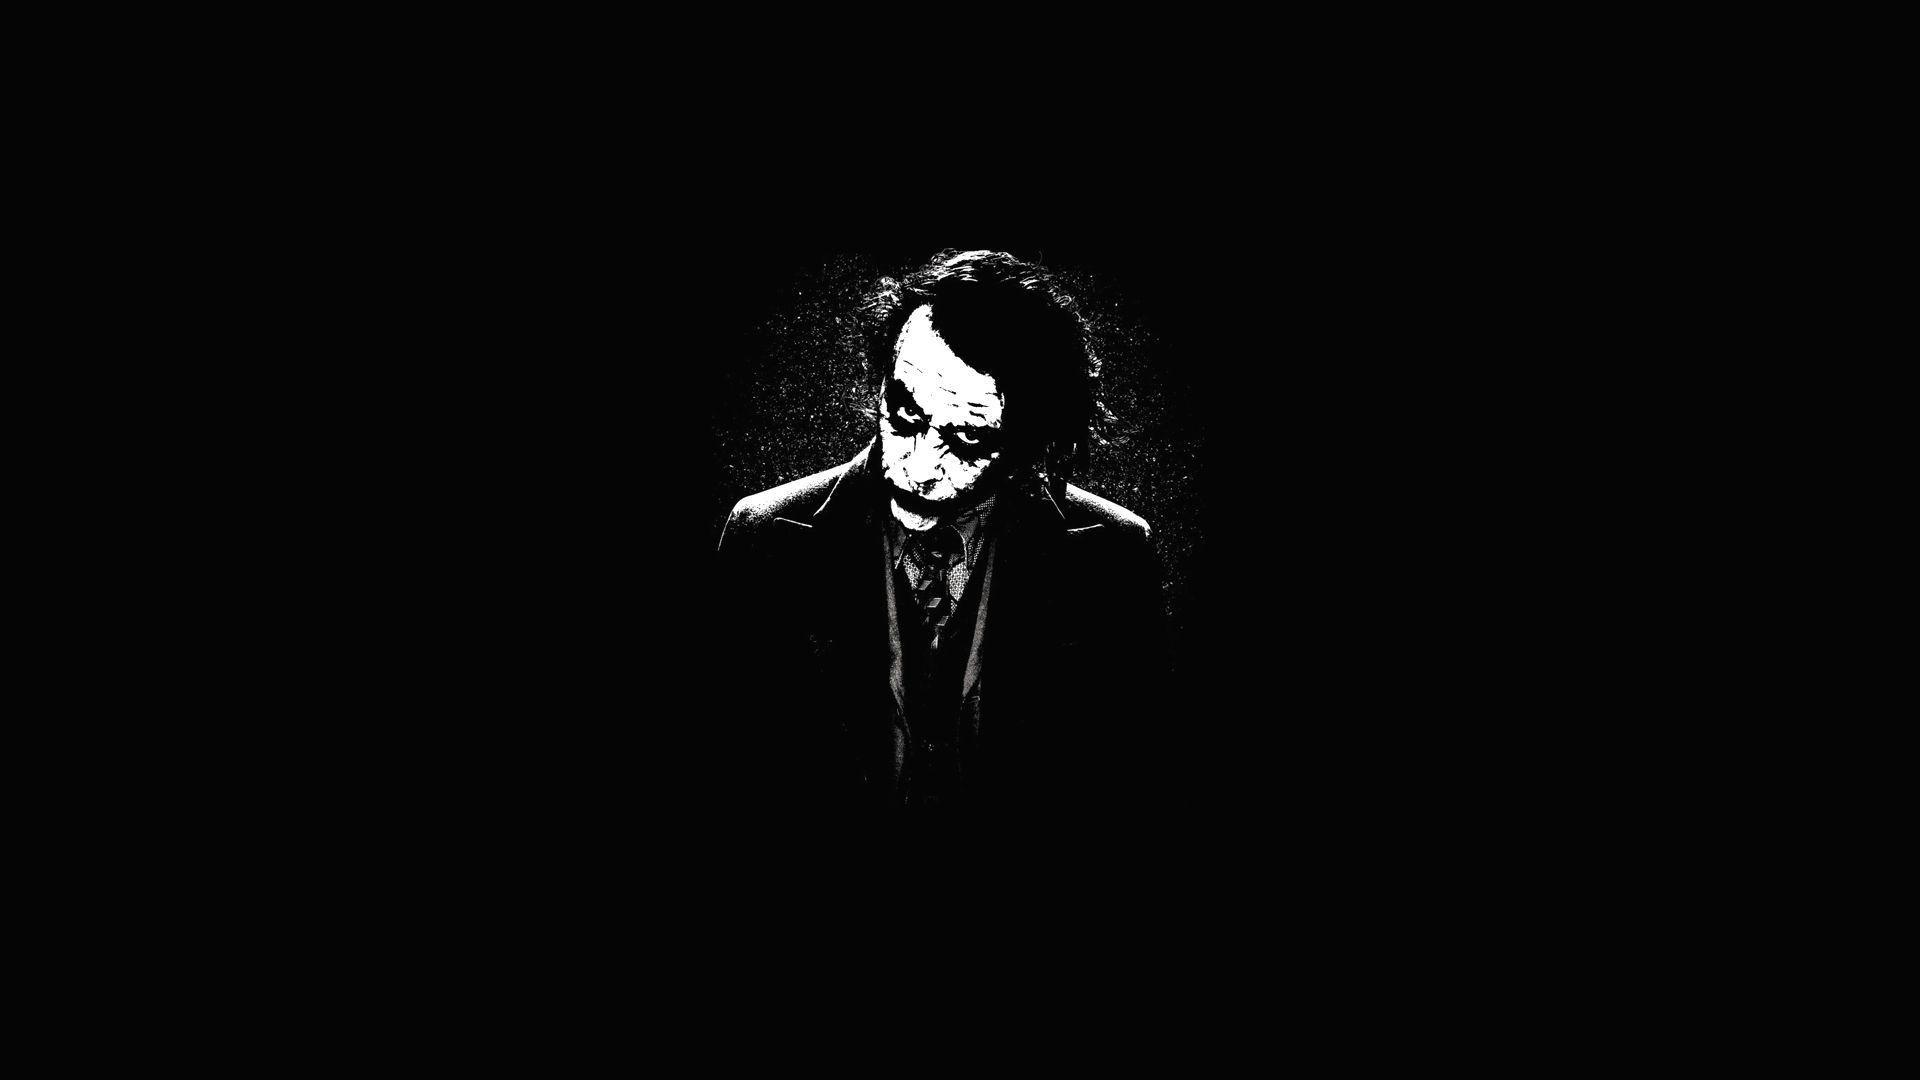 Heath Ledger Joker Wallpaper Anime Joker Typography Messenjahmatt The Dark Knight 1080p Joker Wallpapers Batman Joker Wallpaper Joker Images